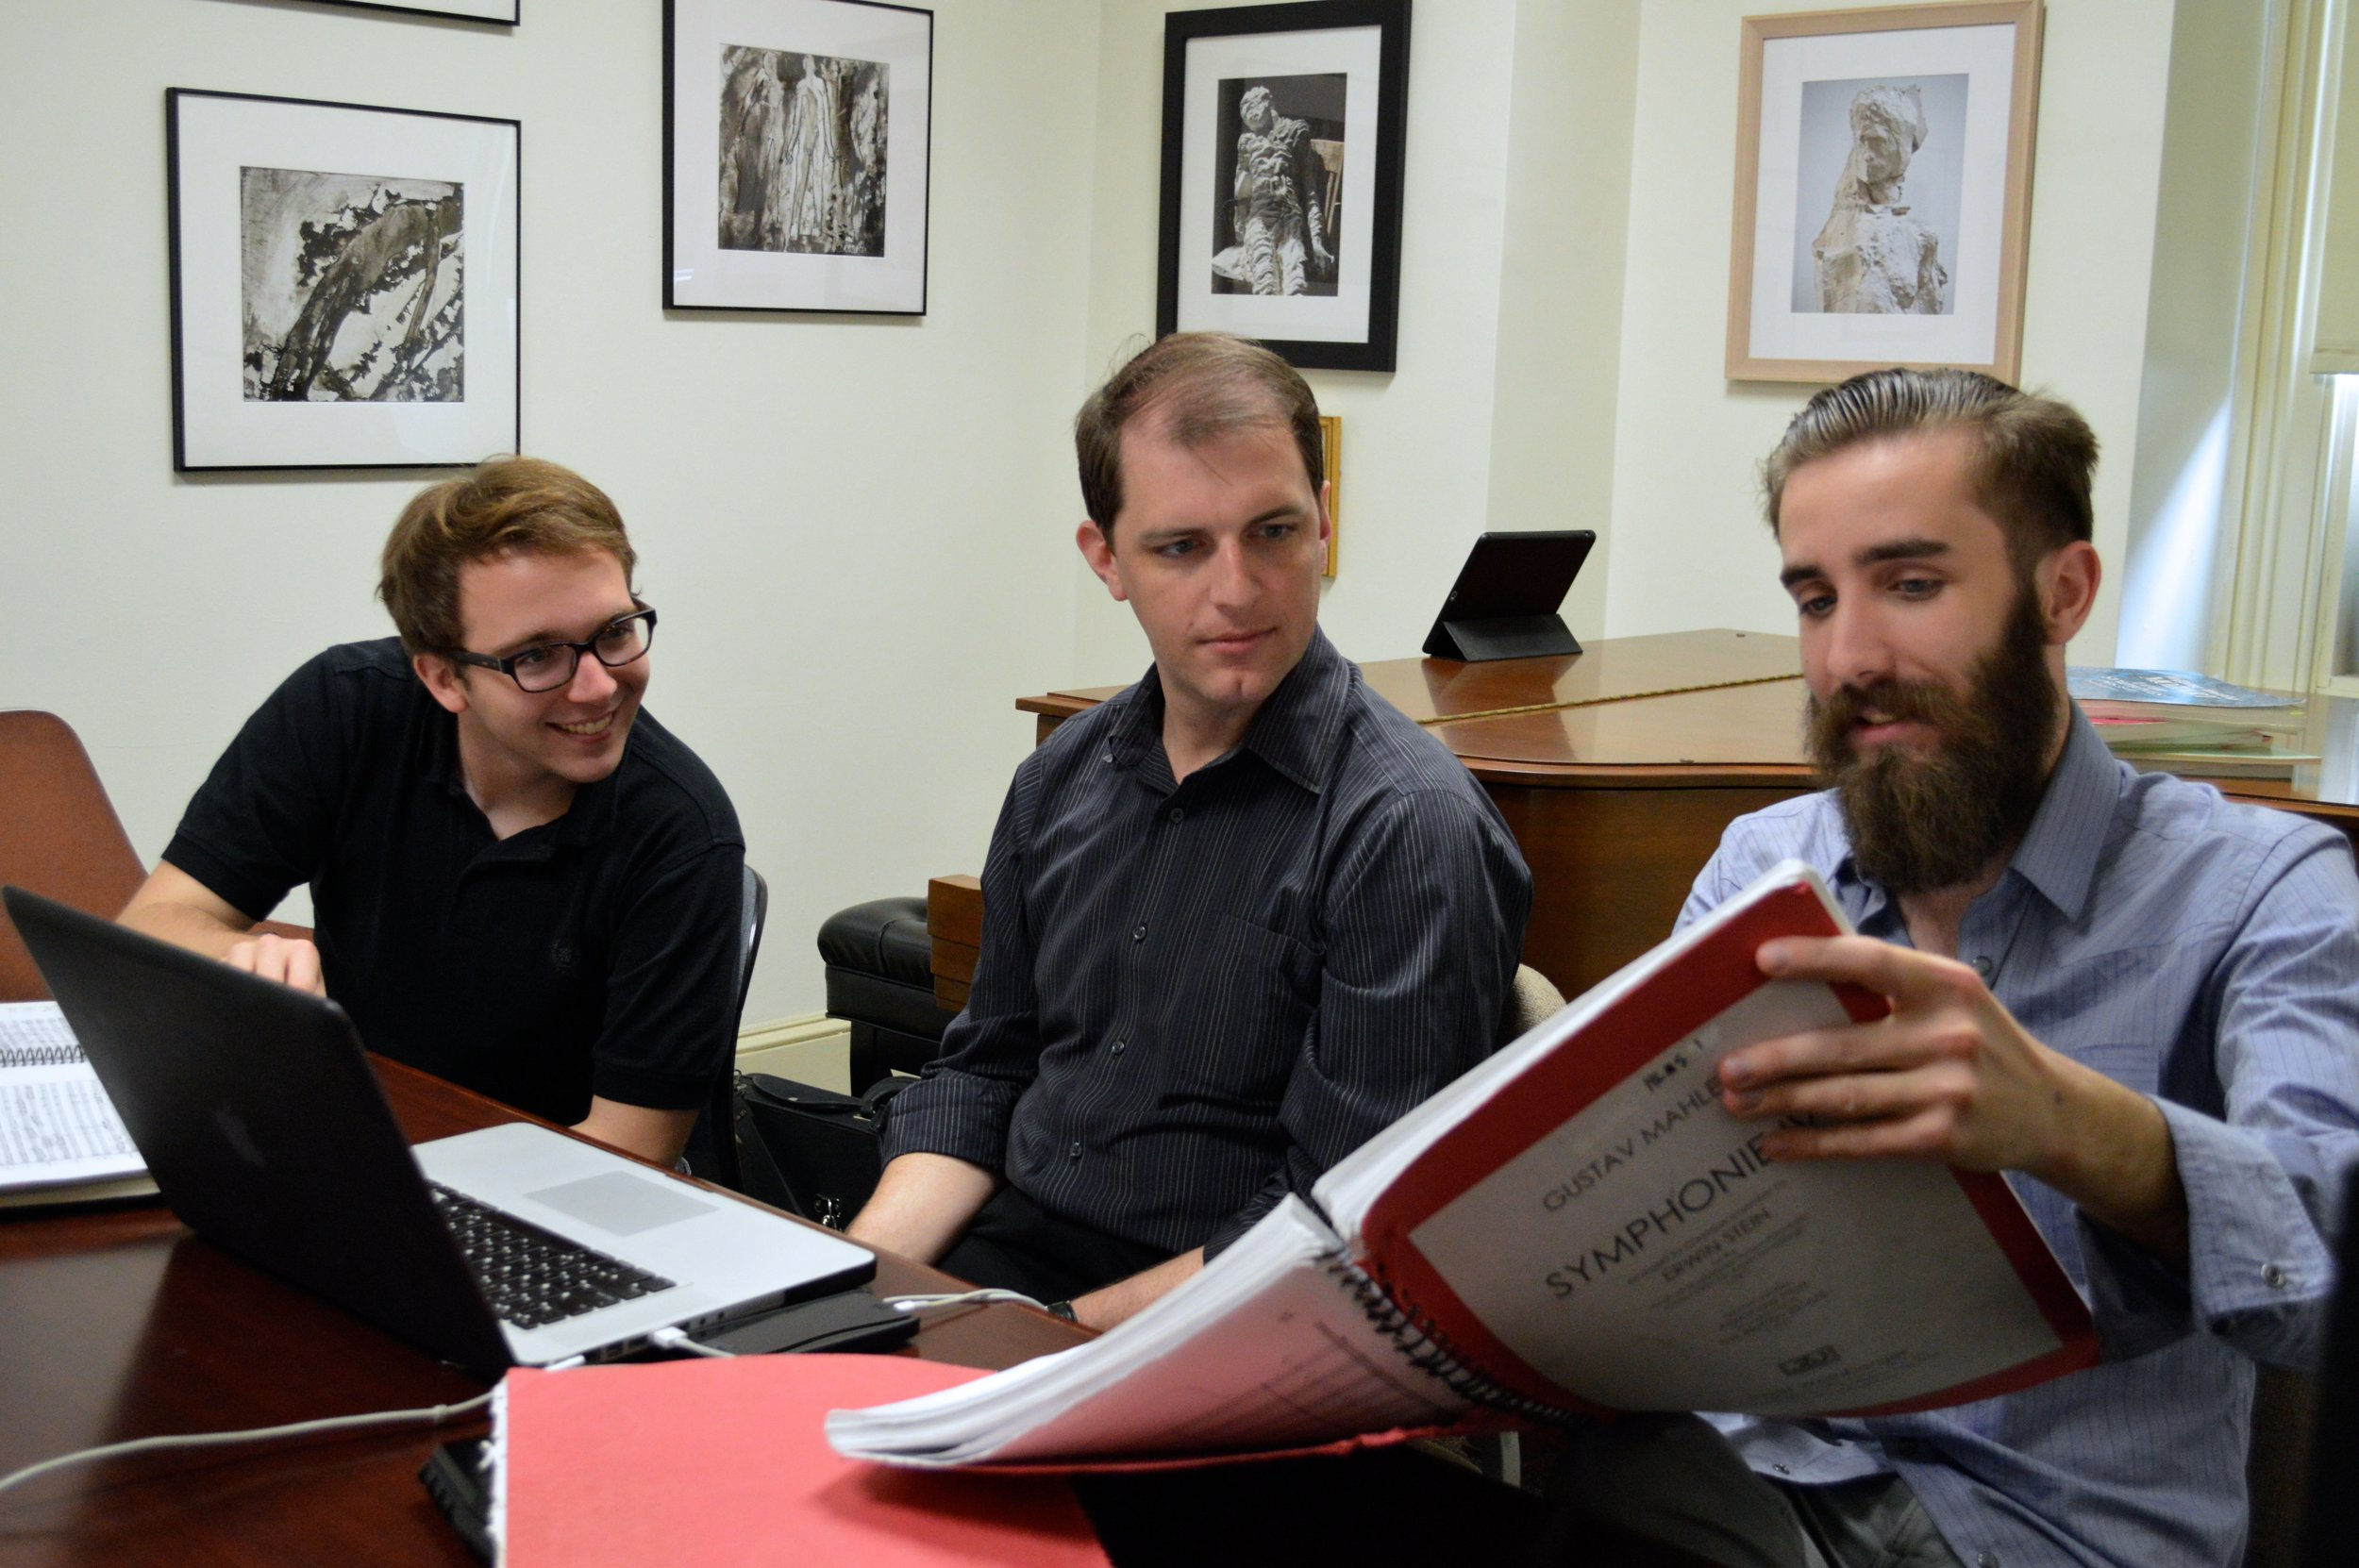 Nicholas Bentz, Jordan Randall Smith, and Christopher Ciampoli